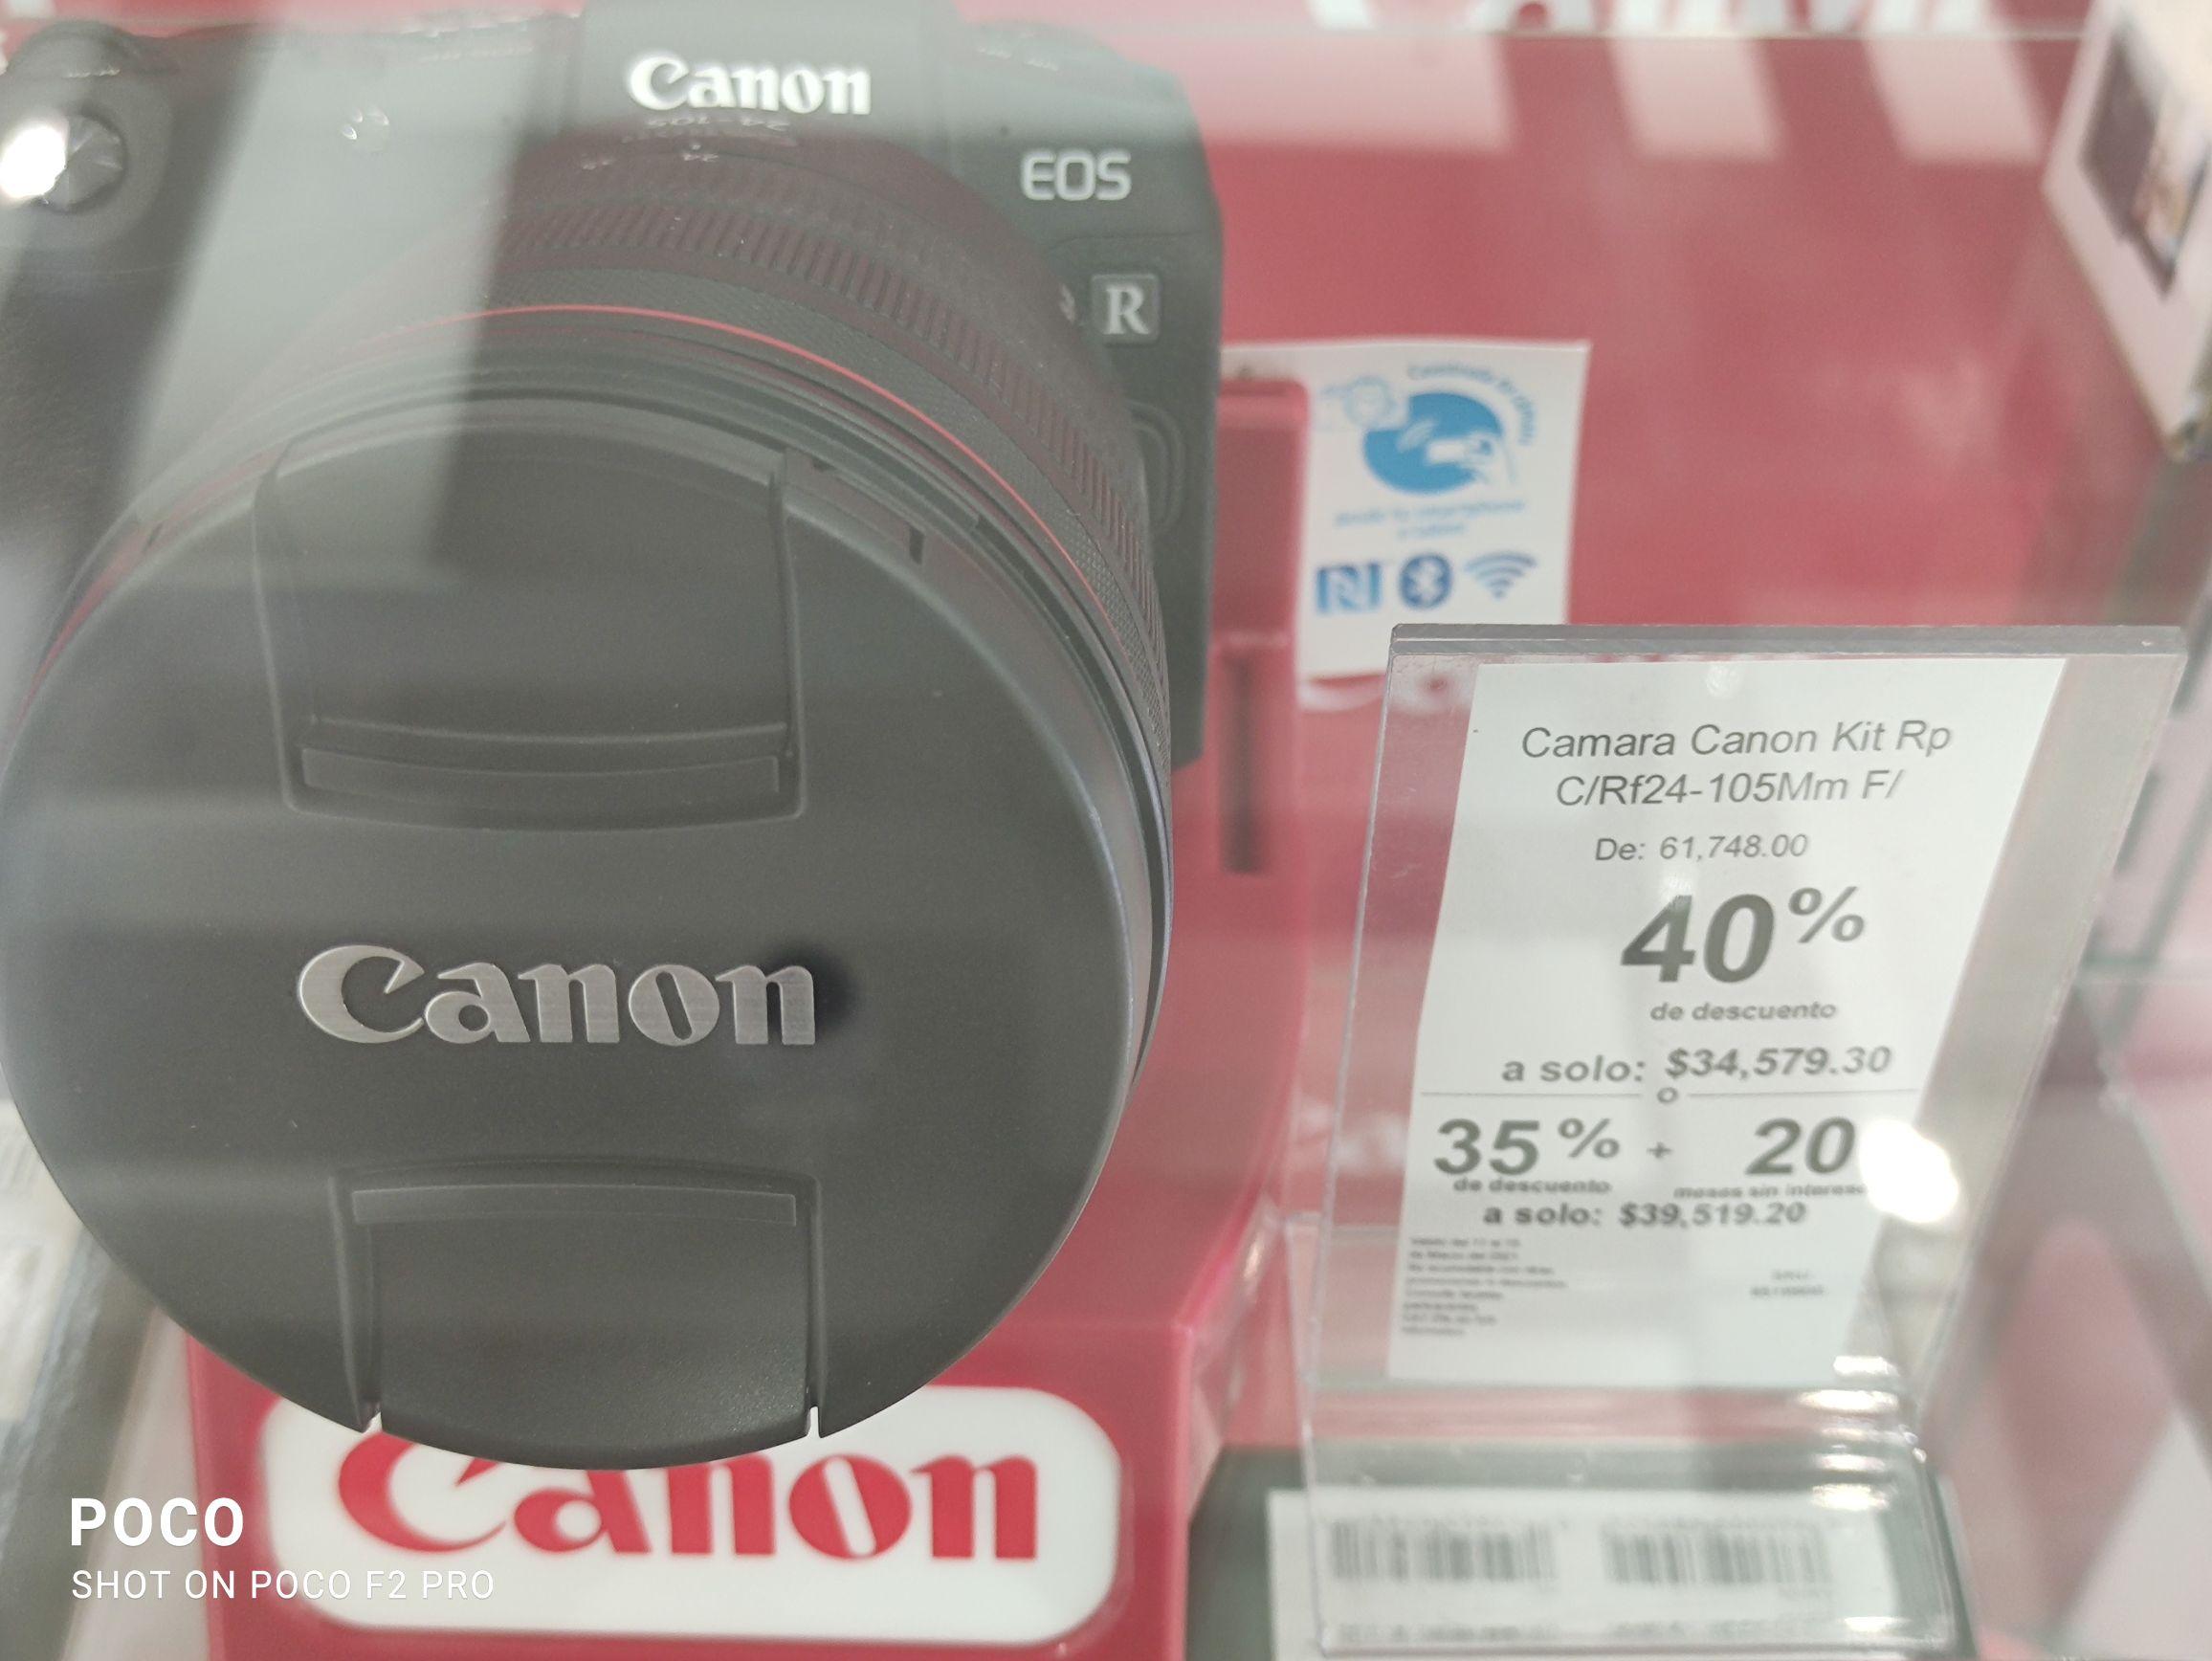 SANBORNS-. CANON EOS RP 24-105mm FULL FRAME de Regalo Camara Mini Replica Eos 5D Mark IV